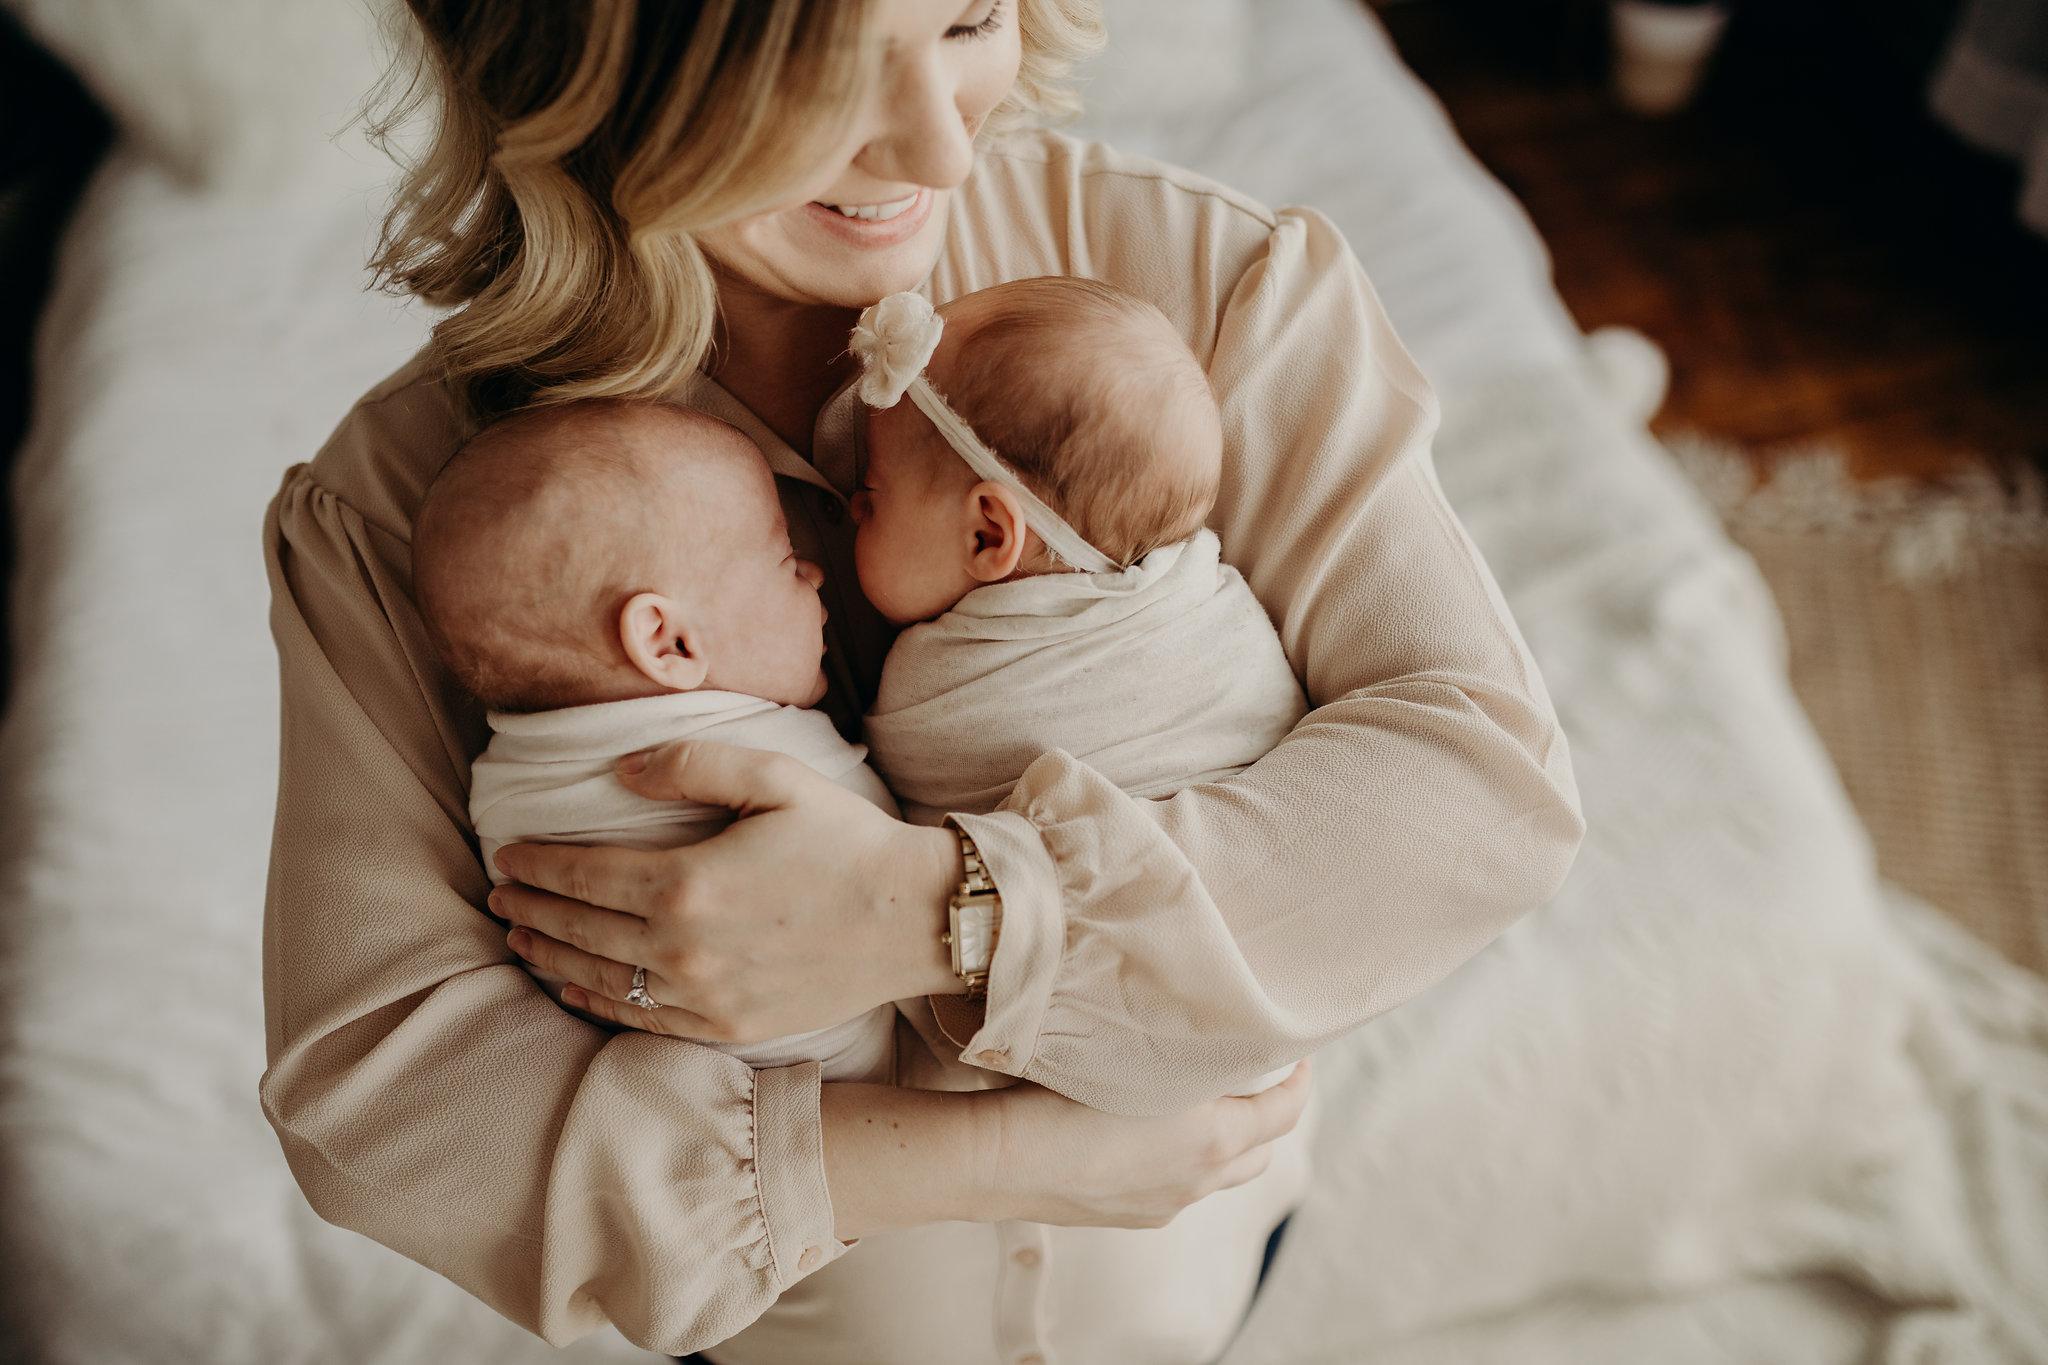 Noah-Emma-Twins-Studio-Newborn-SEssion-Jesse-Salter-Photography-21.jpg